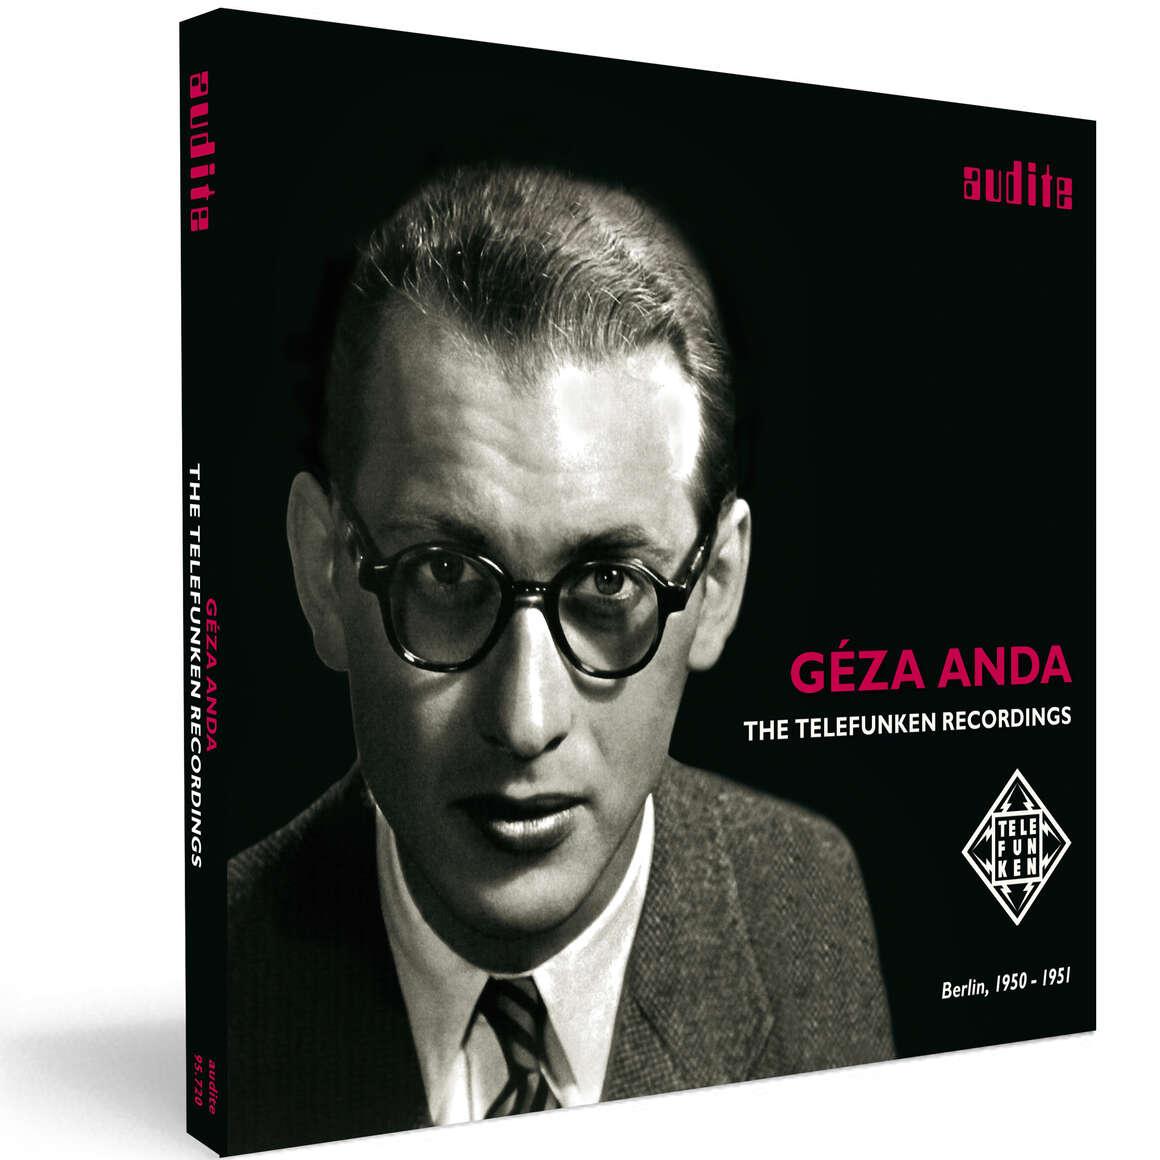 Géza Anda: The Telefunken Recordings